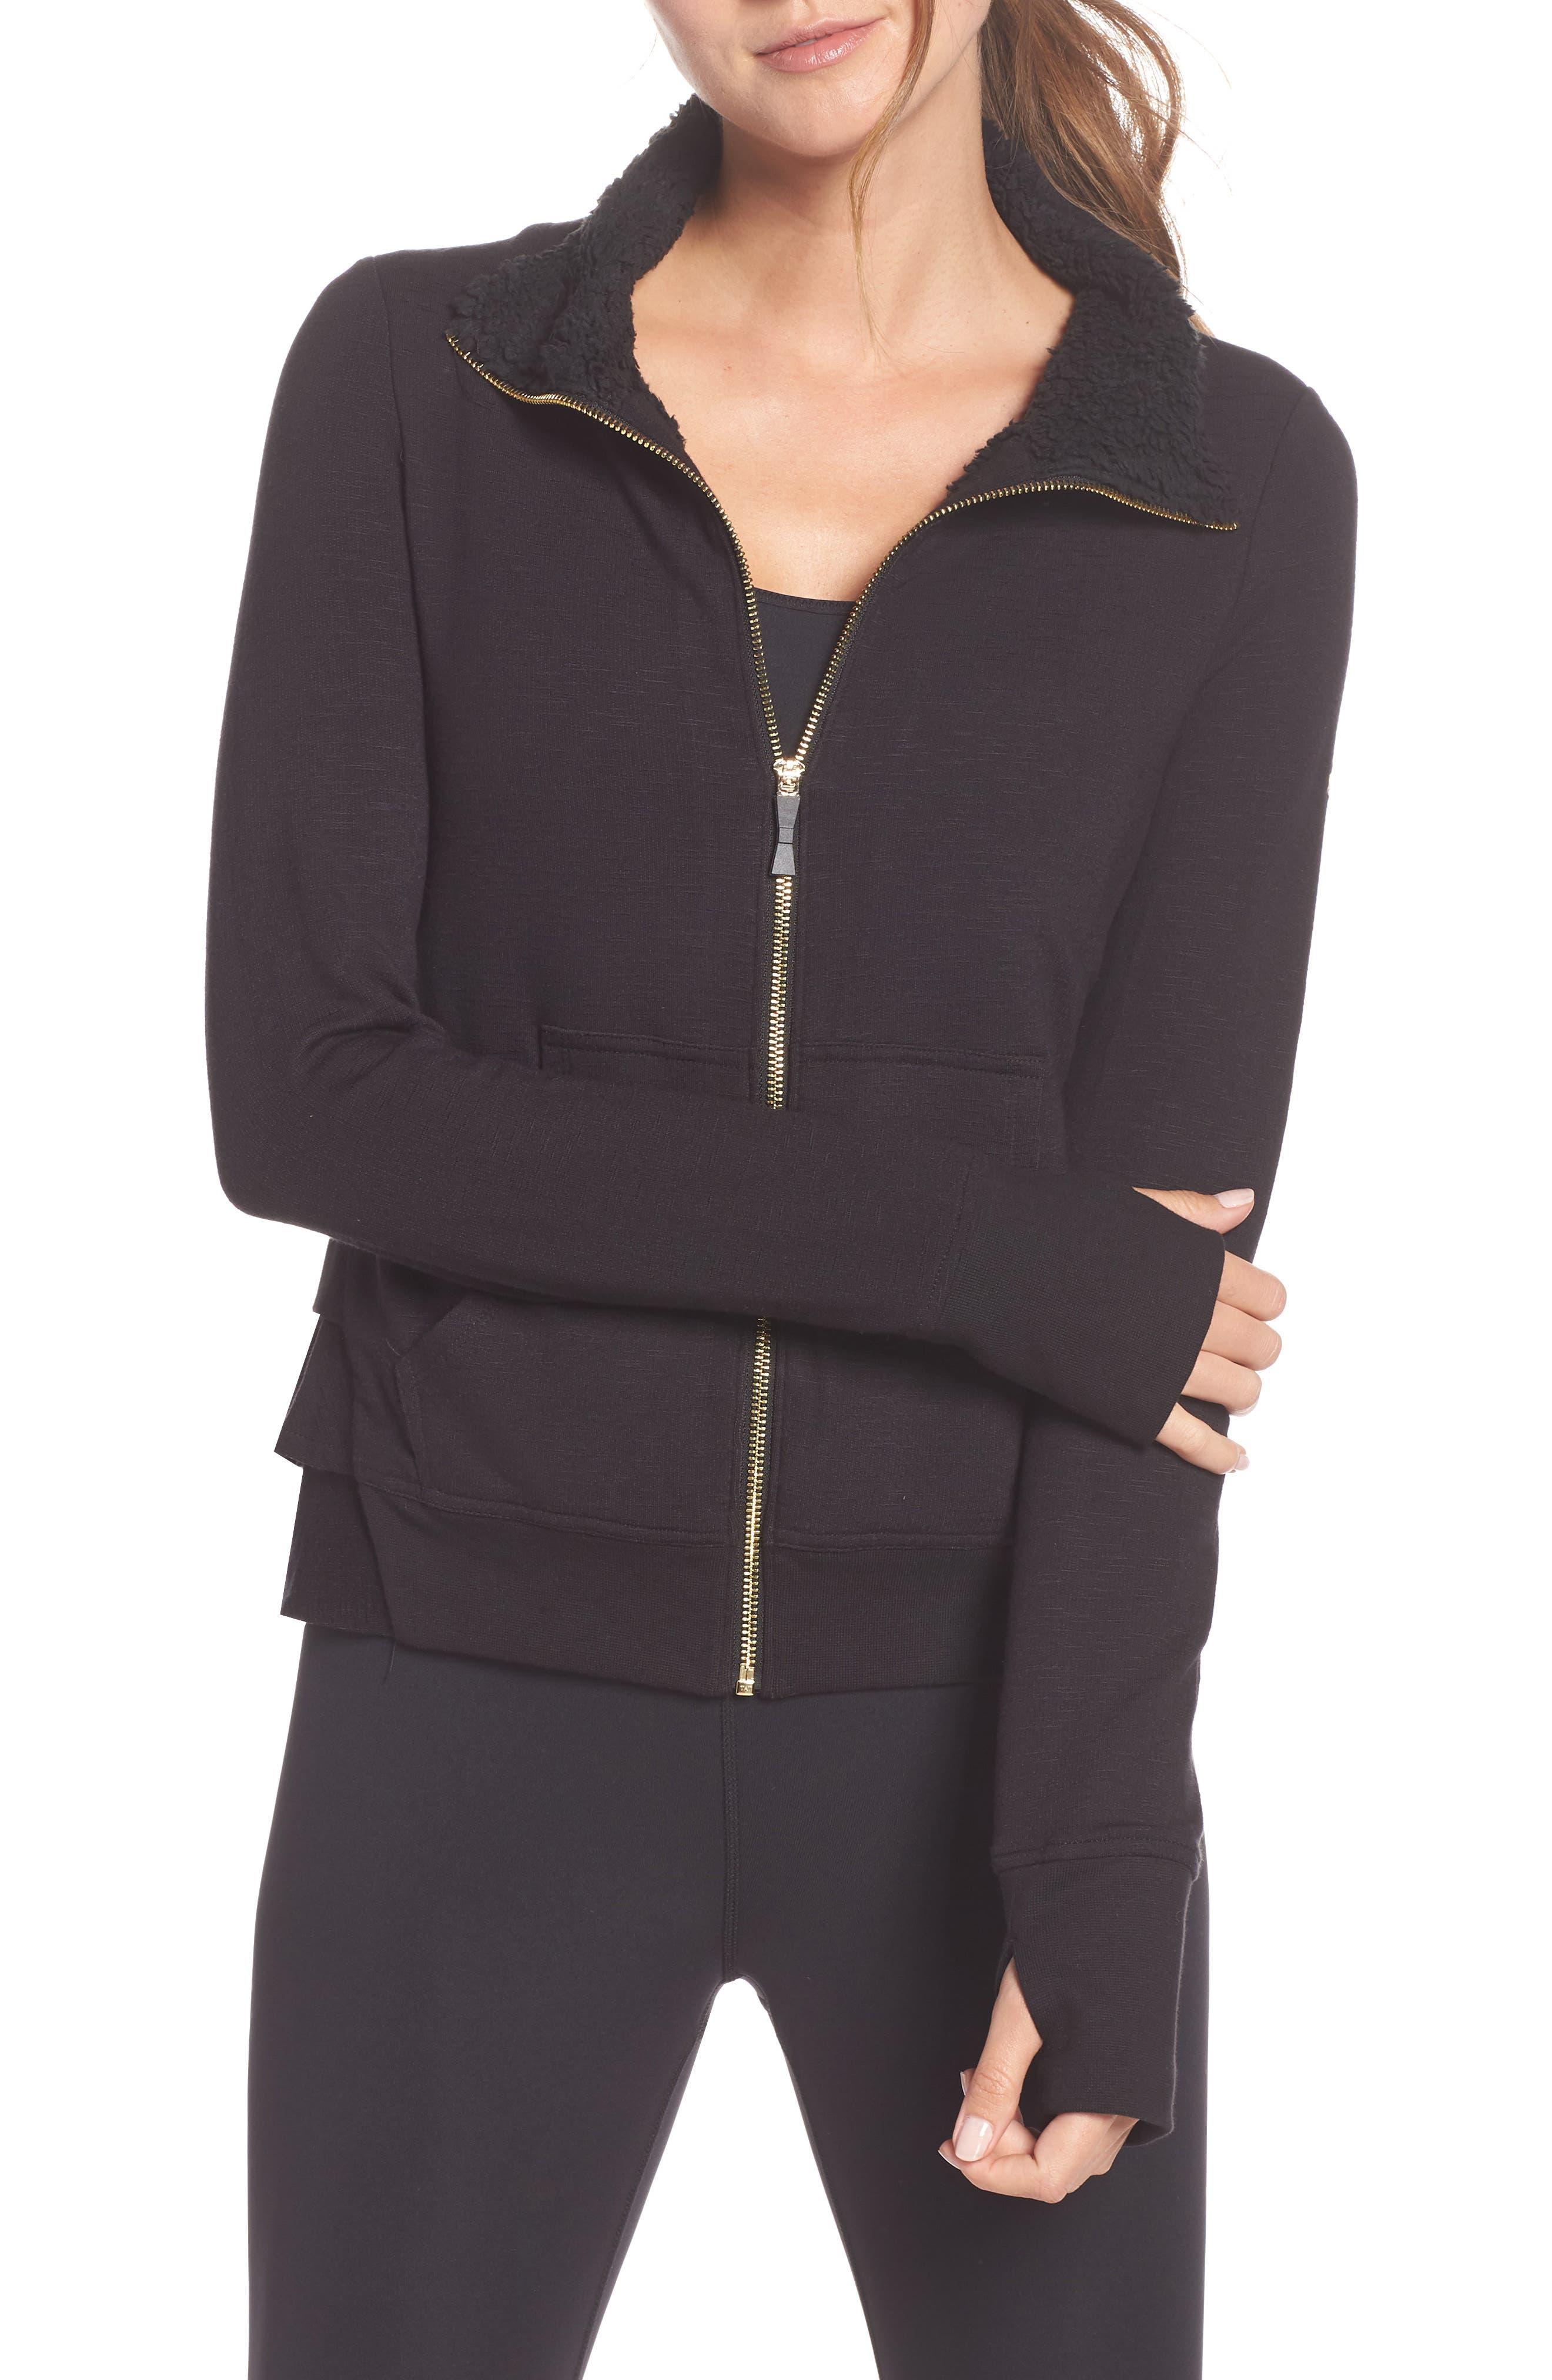 Kate Spade New York Fleece Lined Jacket, Black